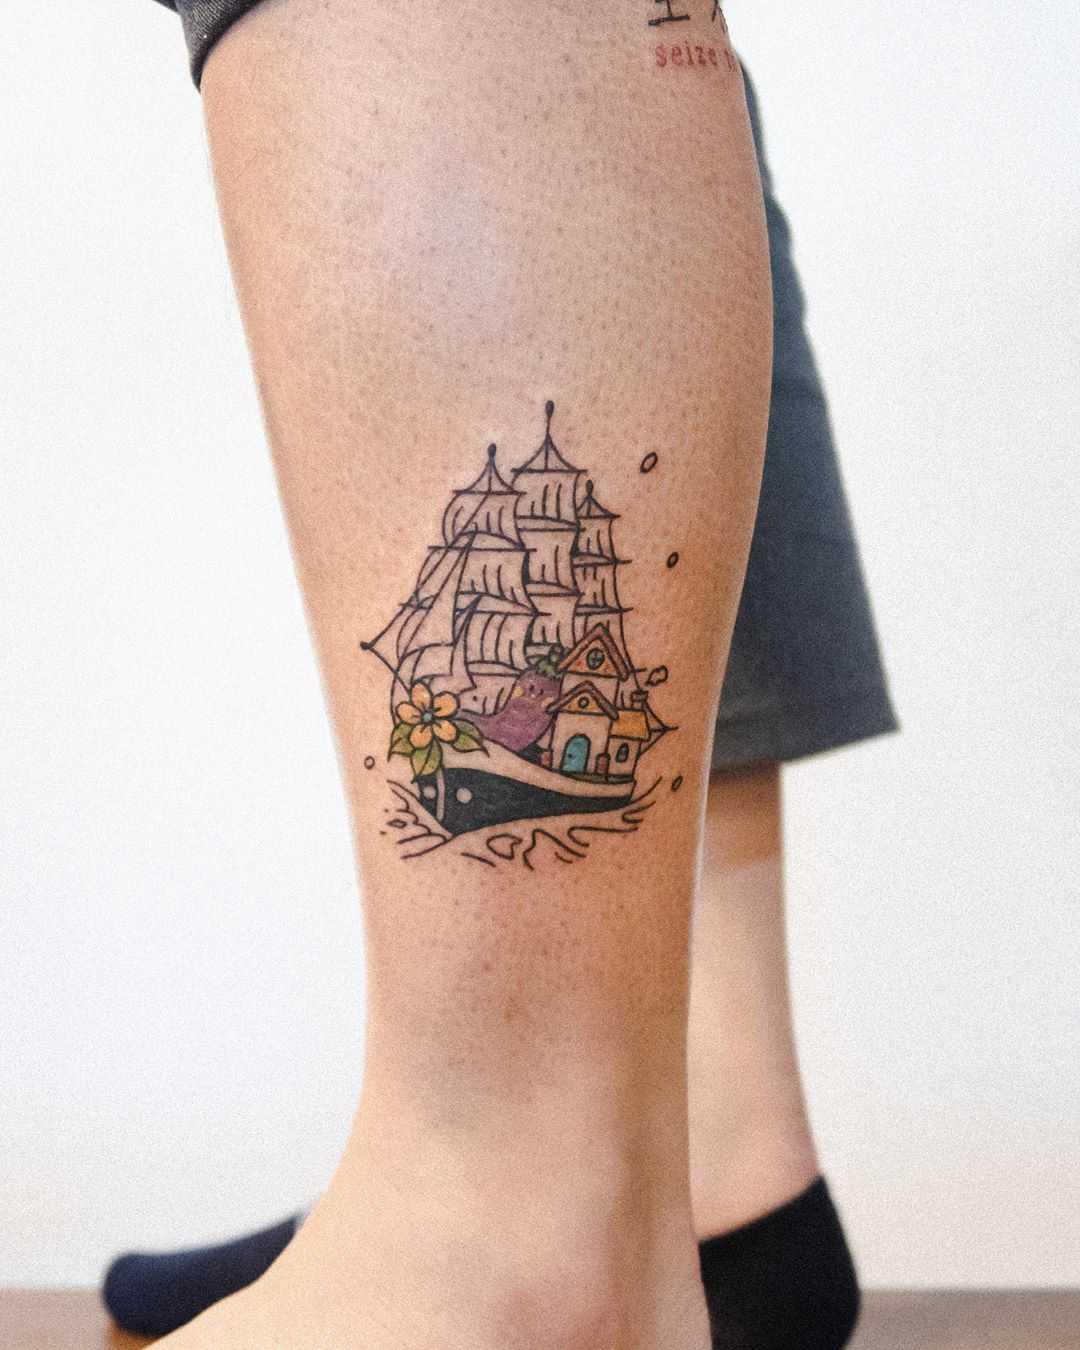 Vegetable ship by tattooist Bongkee